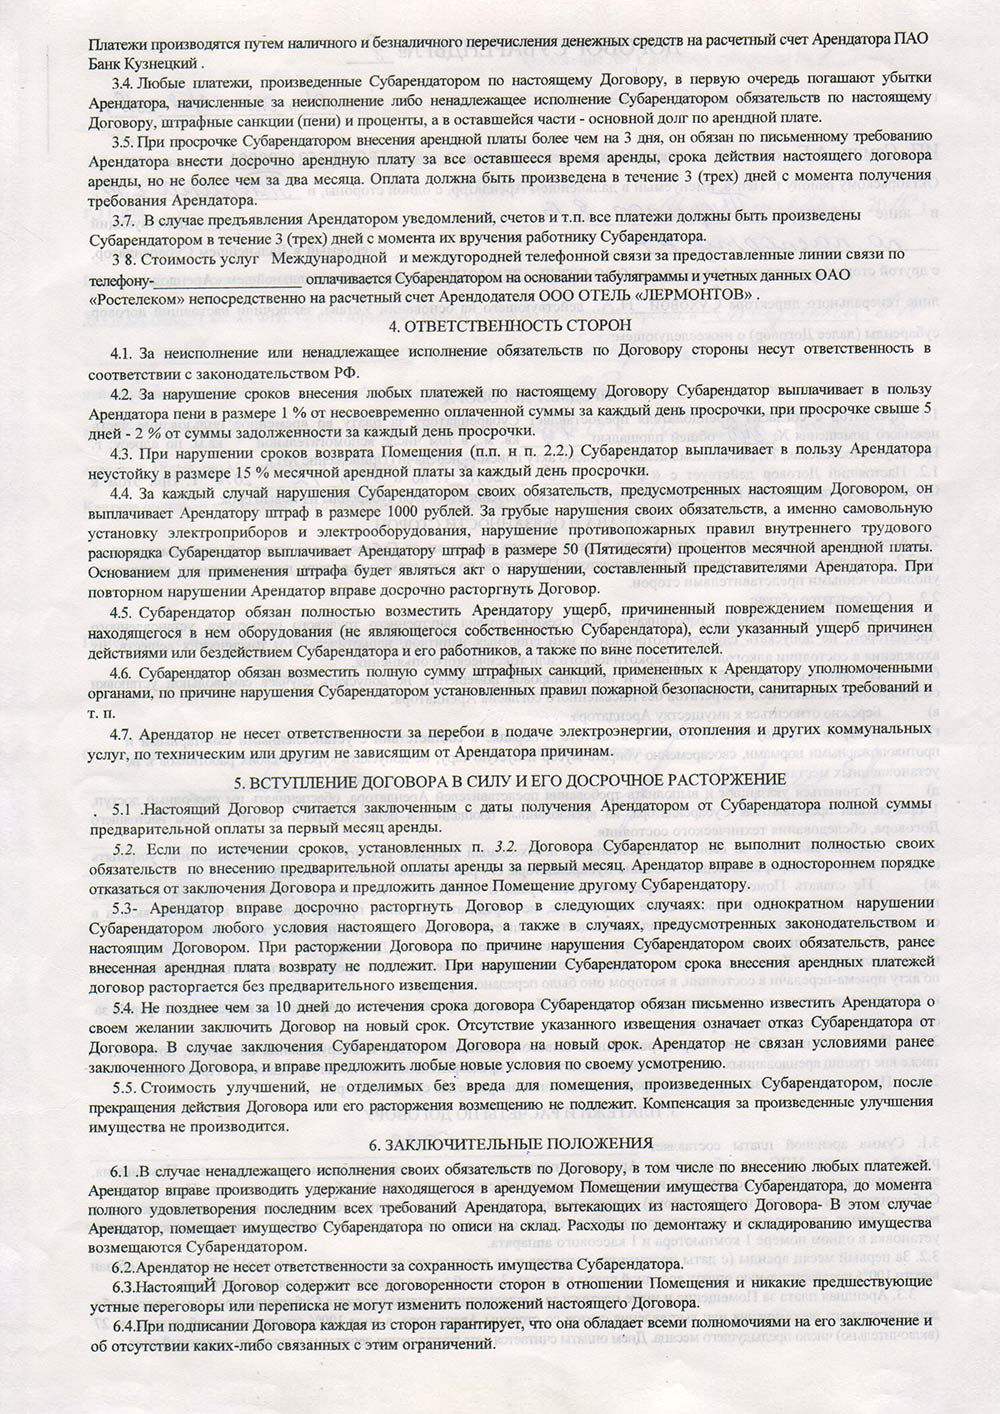 Договор аренды за4квартал 2018 года